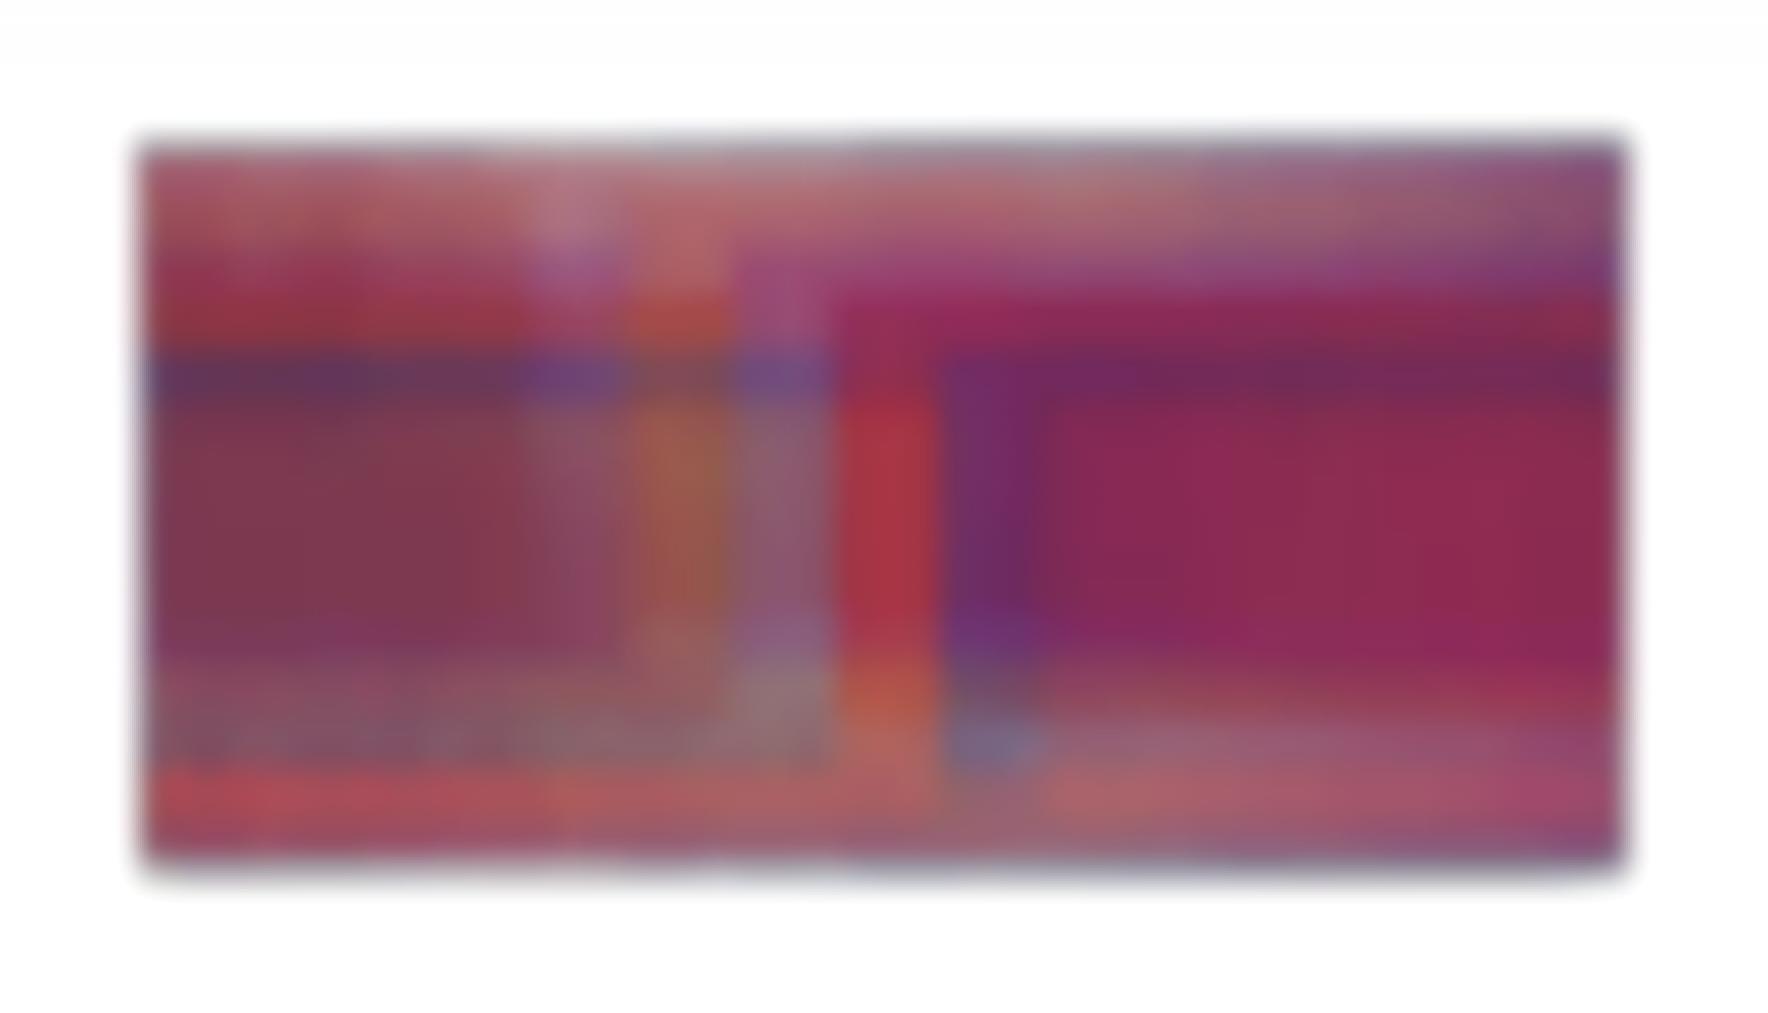 Carlos Cruz-Diez-Physichromie No. 588-1972